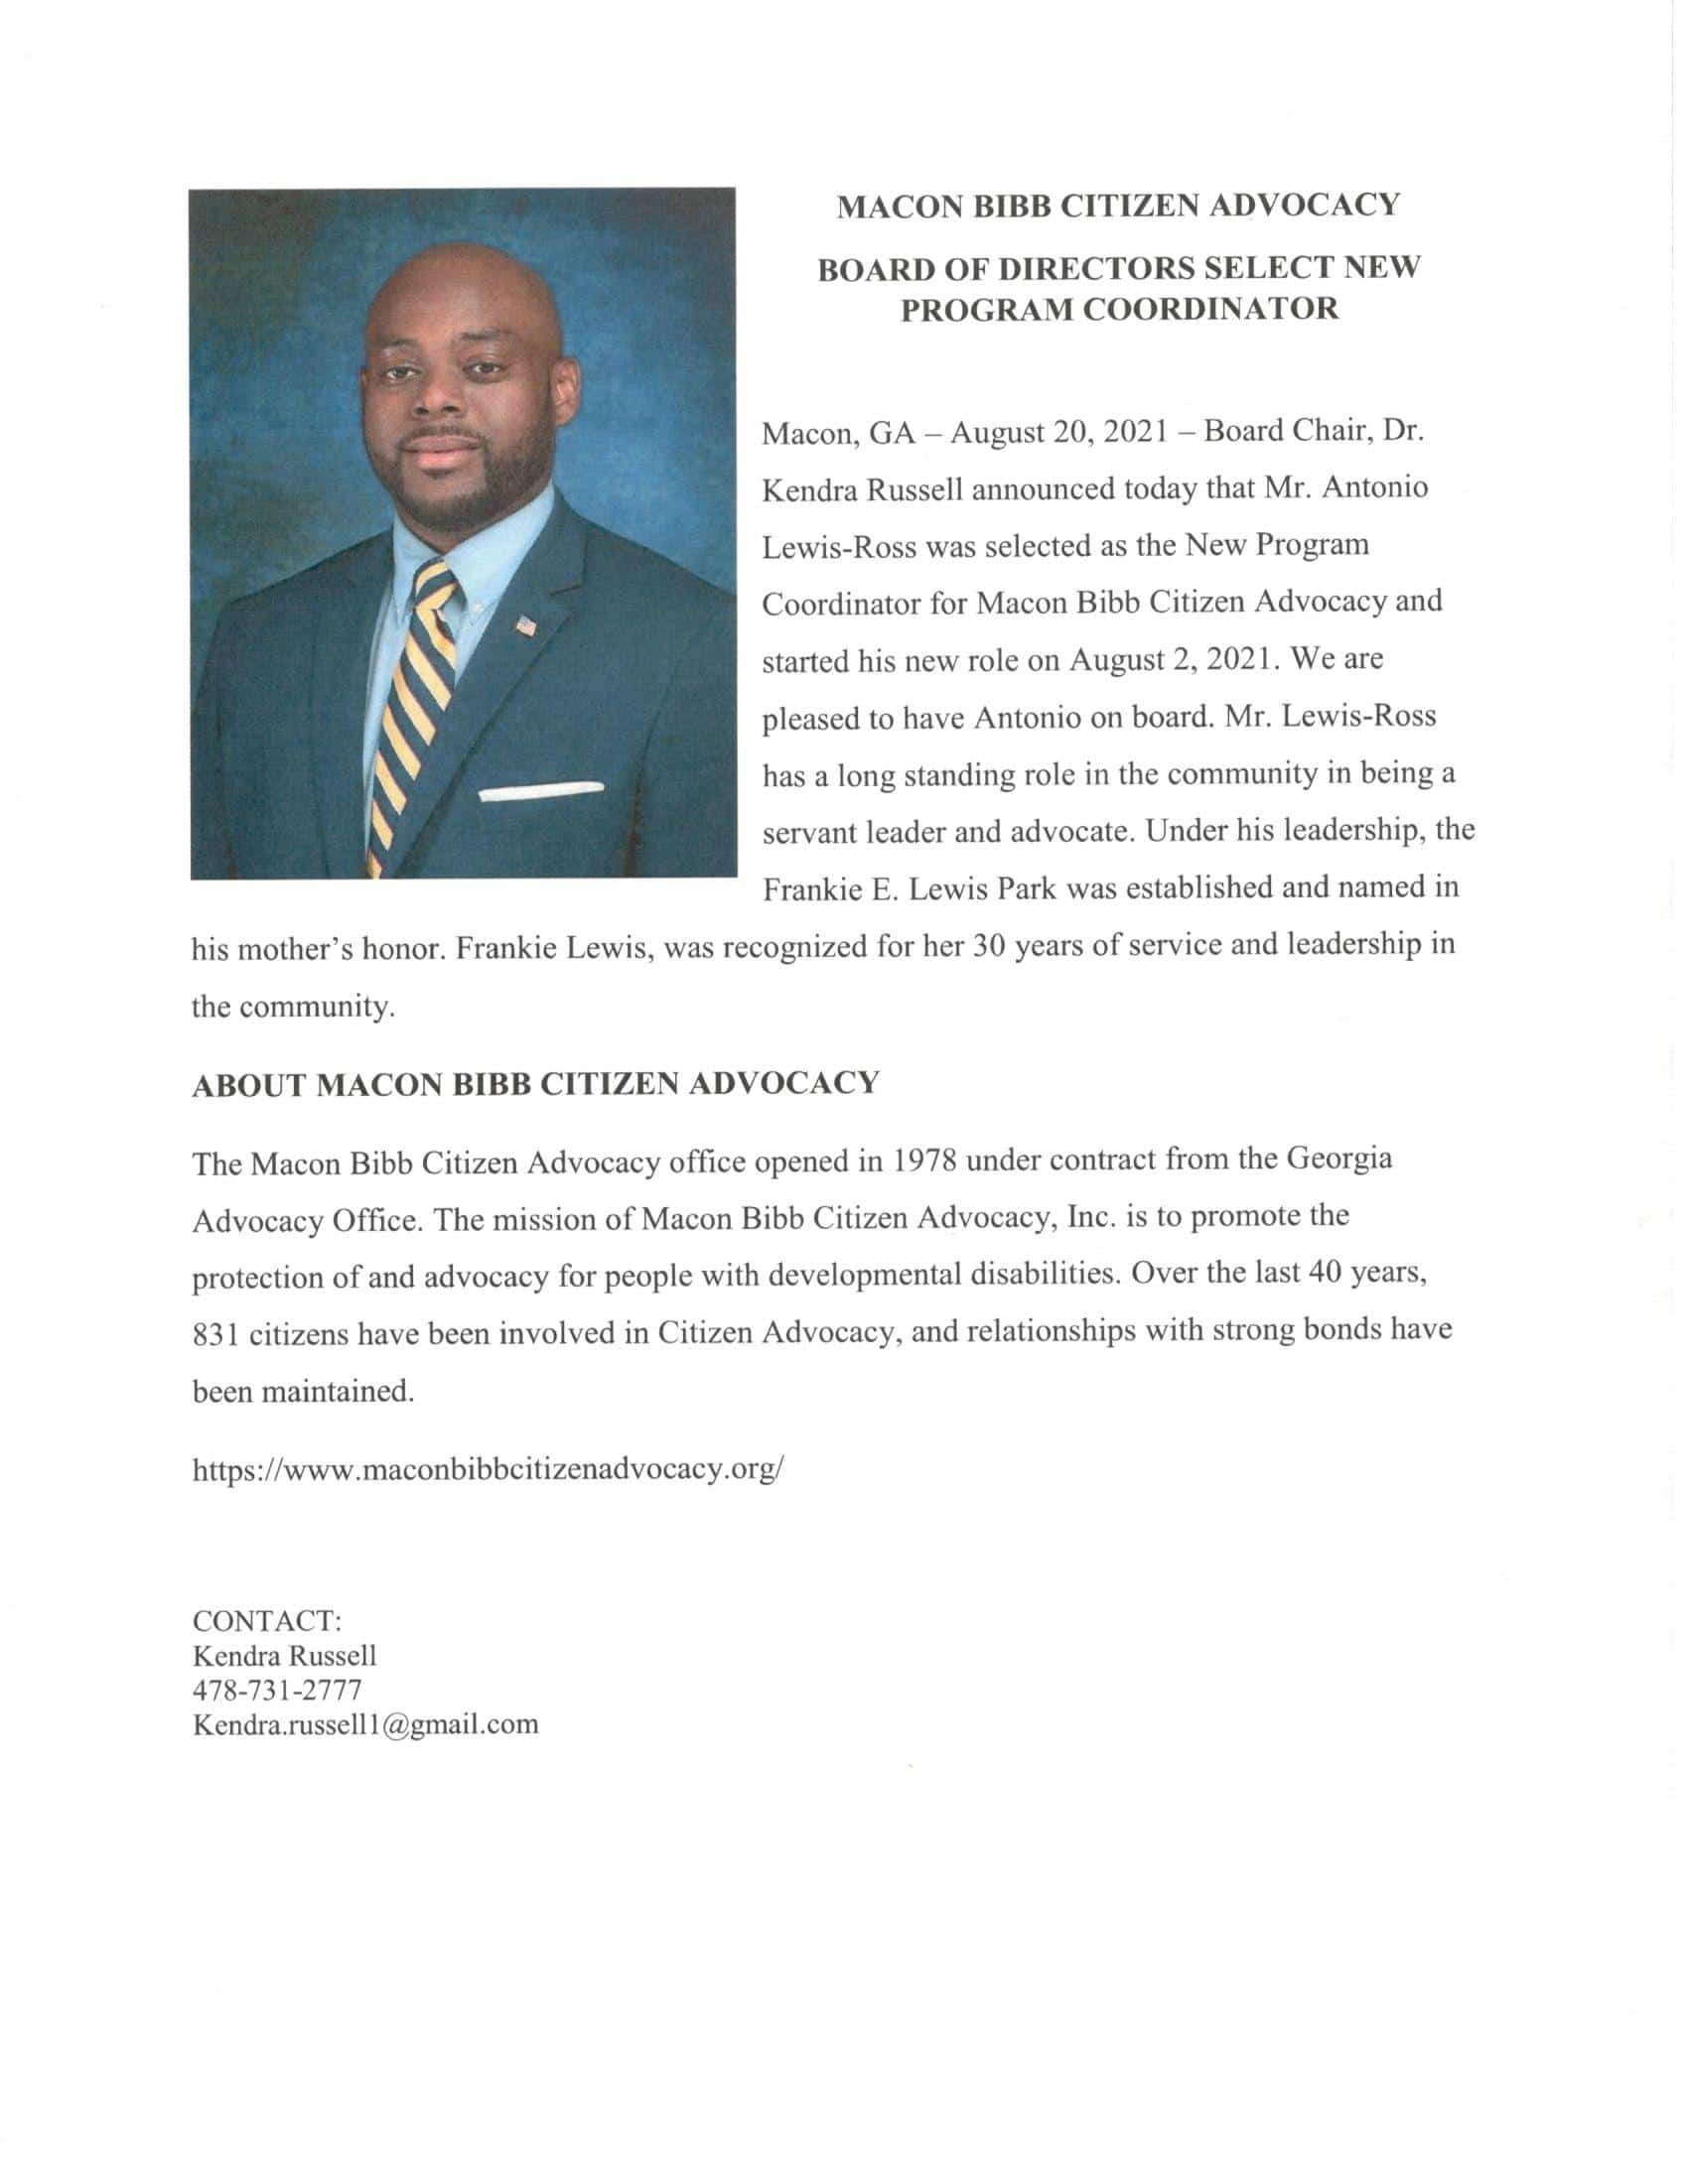 Antonio Press Release